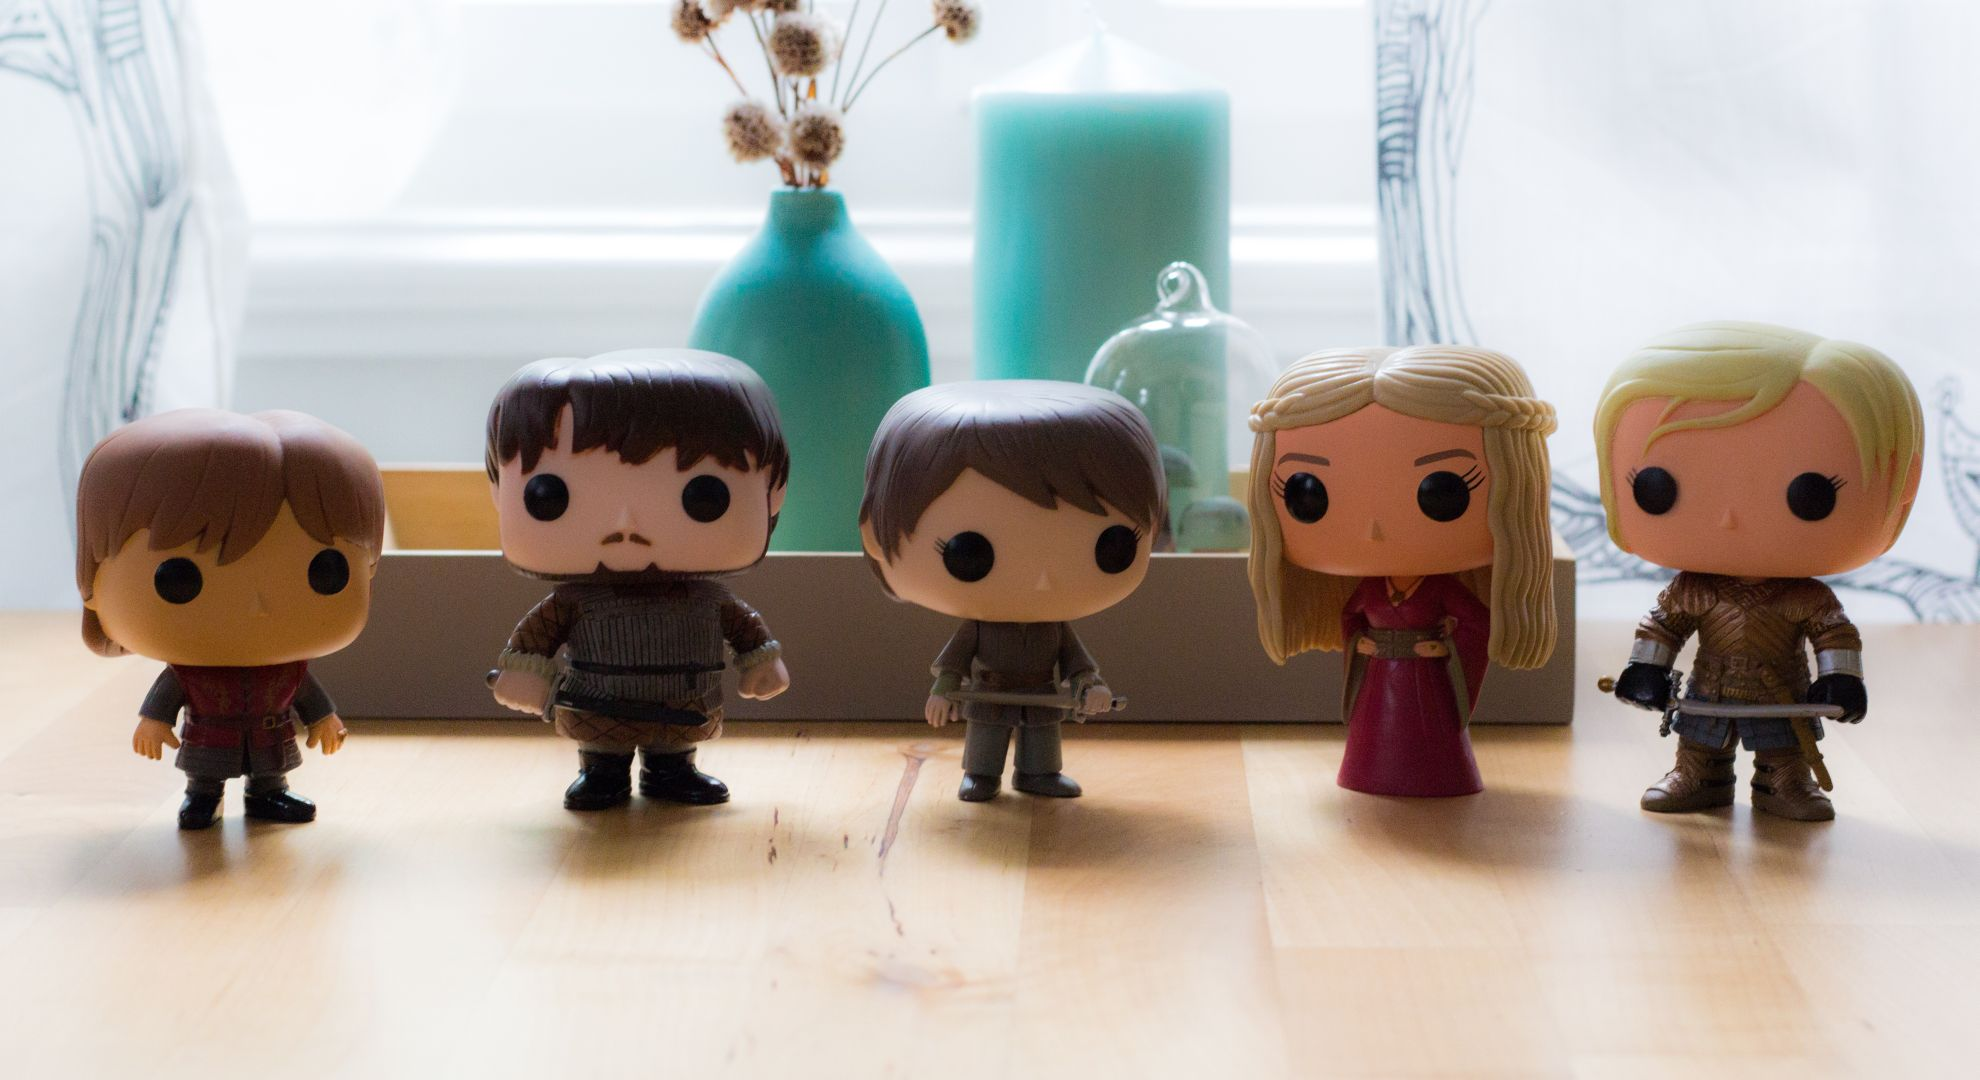 Gewinnt diese süßen Game of Thrones-Stars. (Foto: GamingGadgets.de)